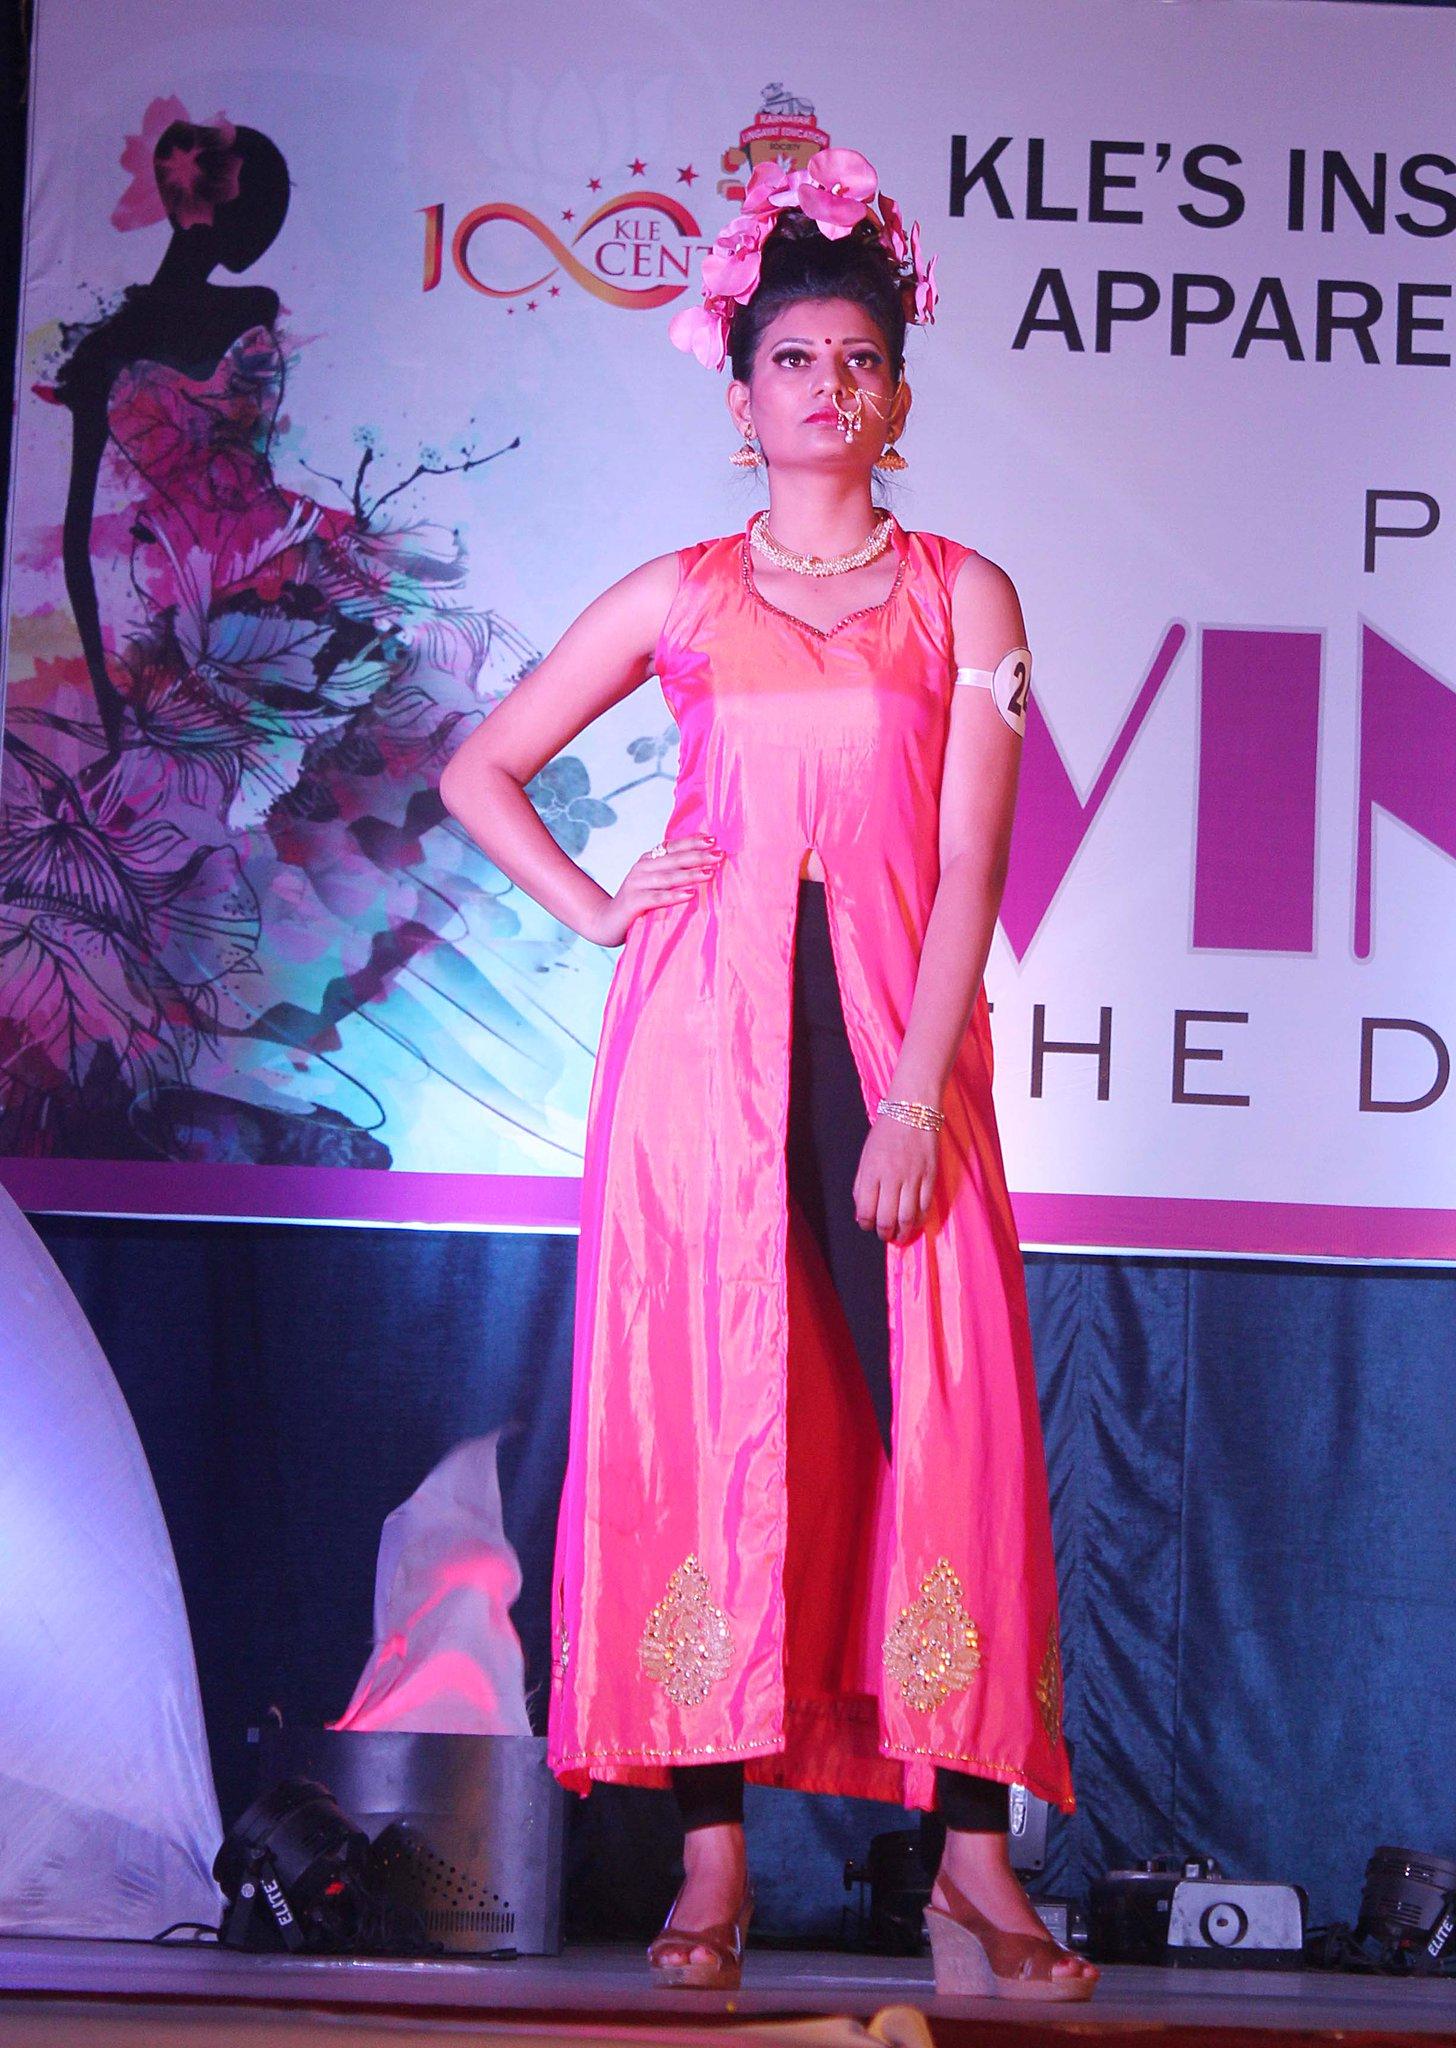 All About Belgaum On Twitter Kle S Institute Of Fashion Technology Vinyasa Fashionshow Belaagvi Fashion Ramp